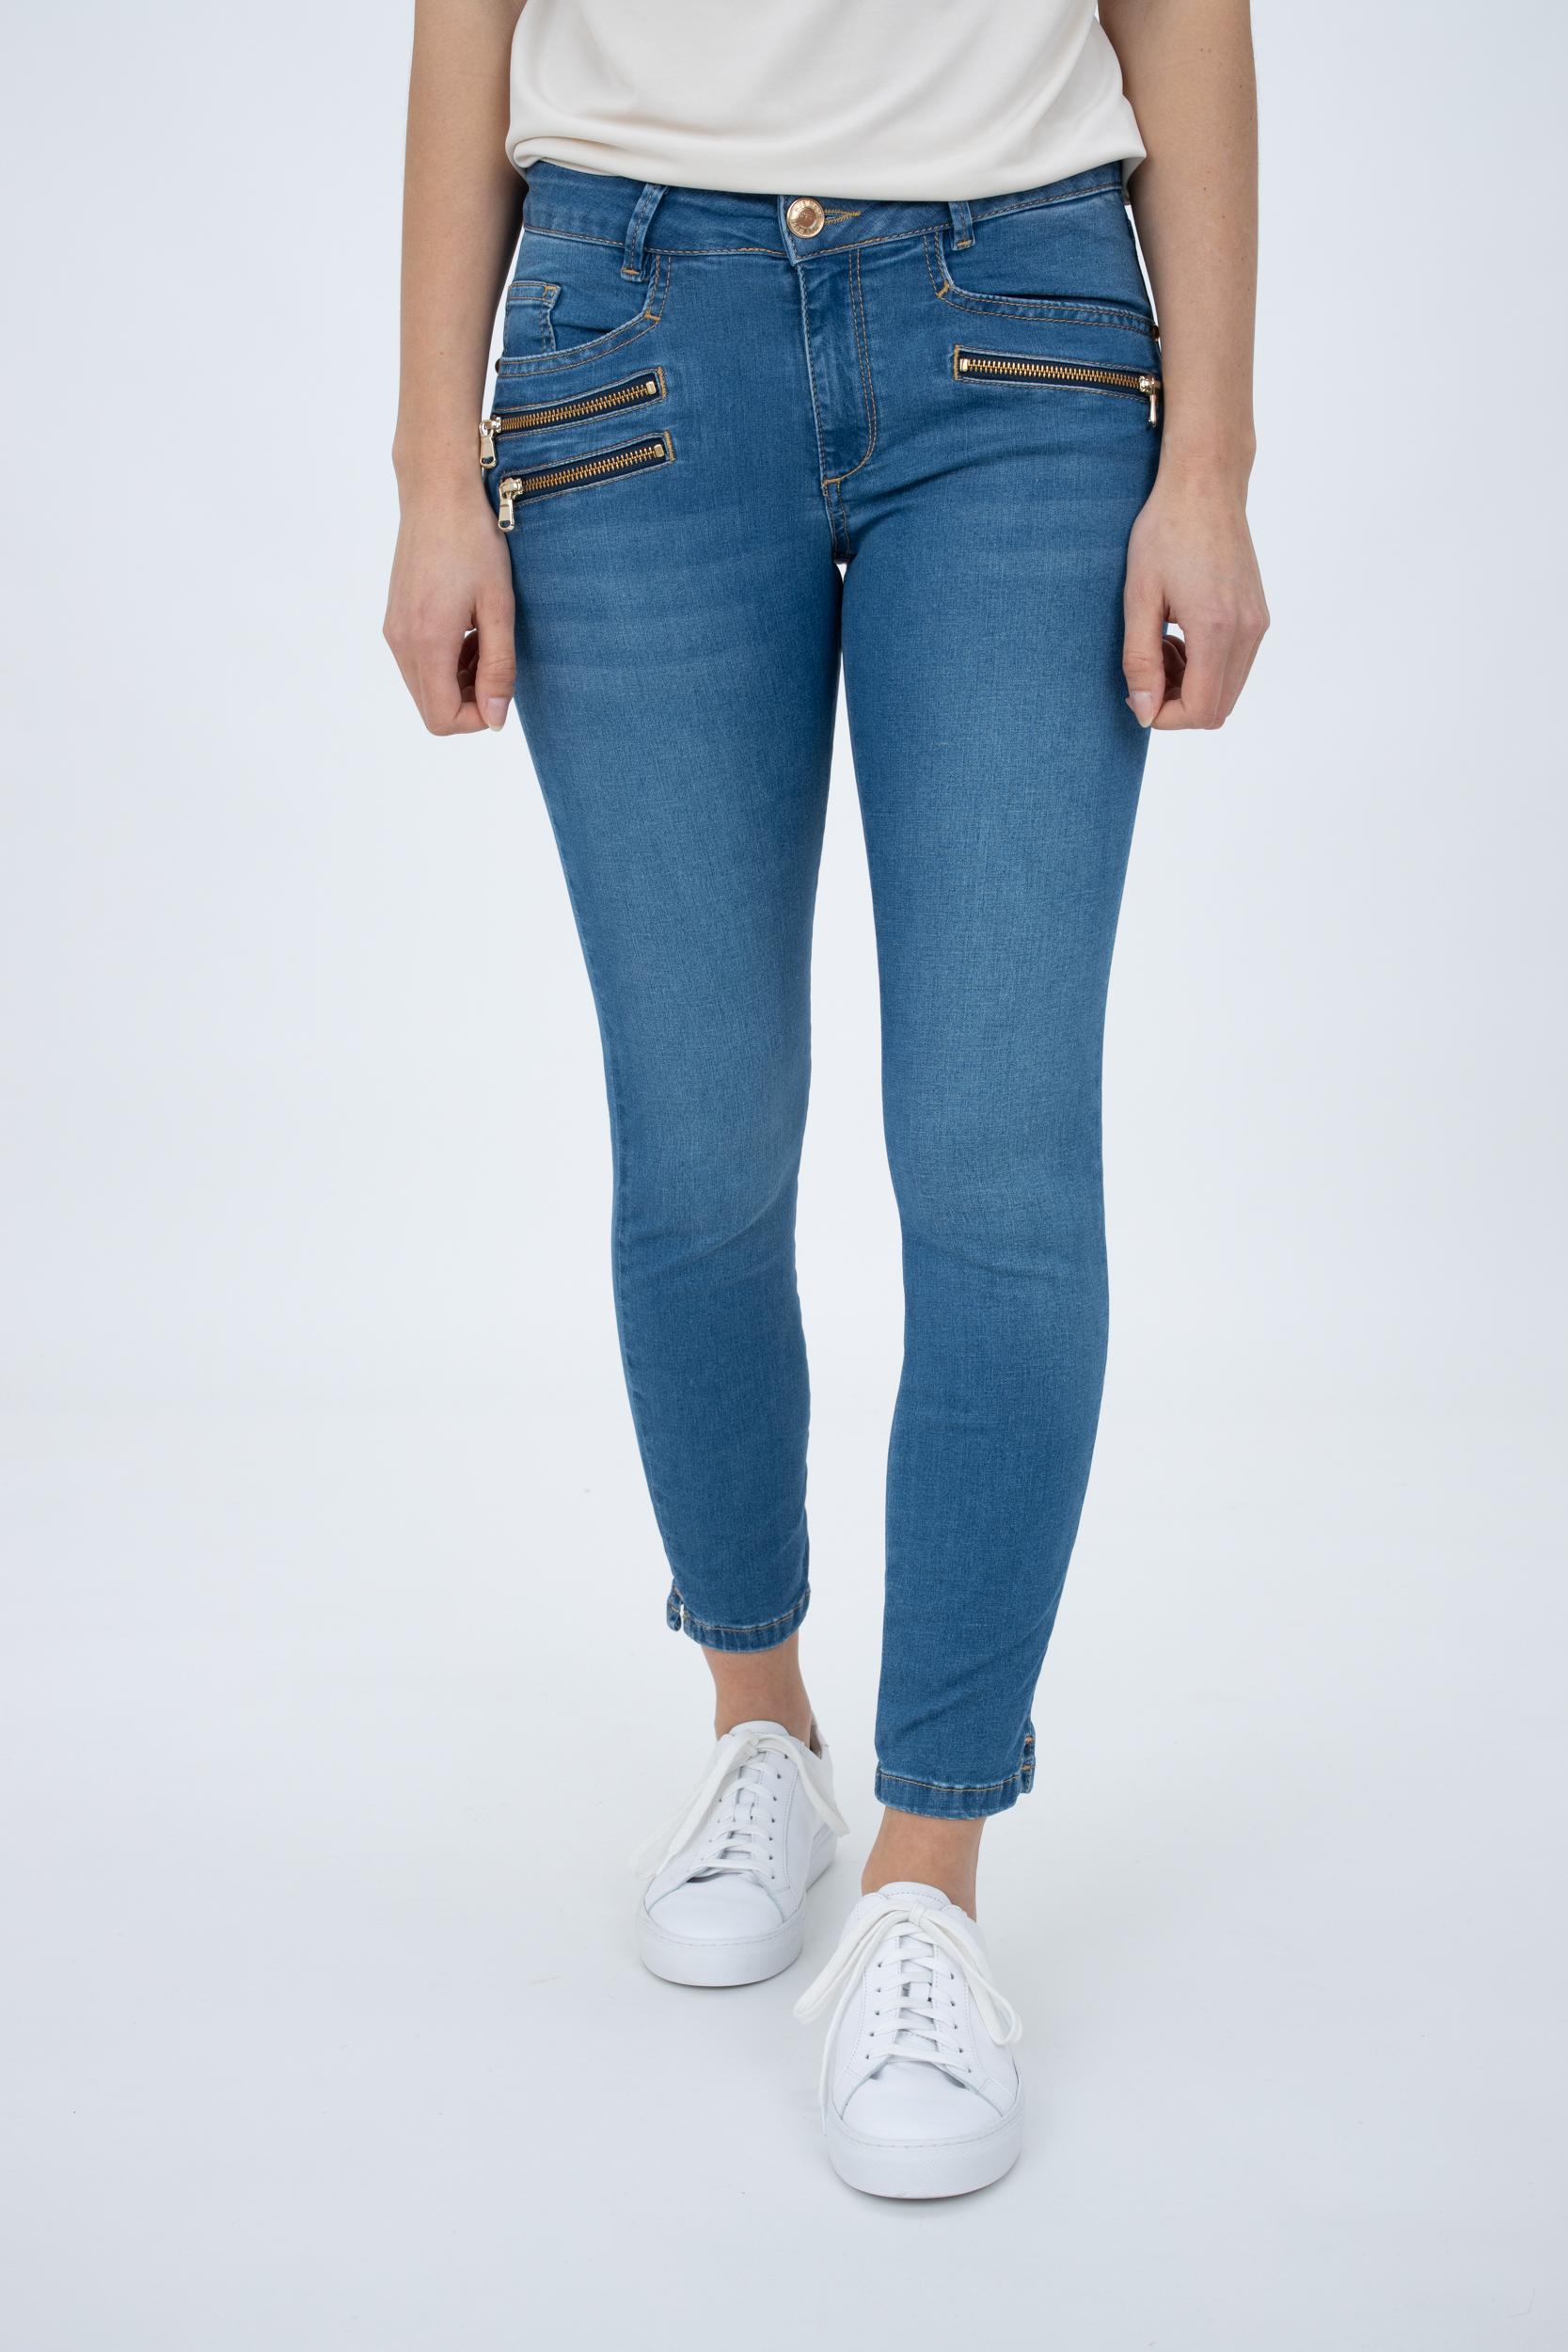 Jeans Berlin Satin